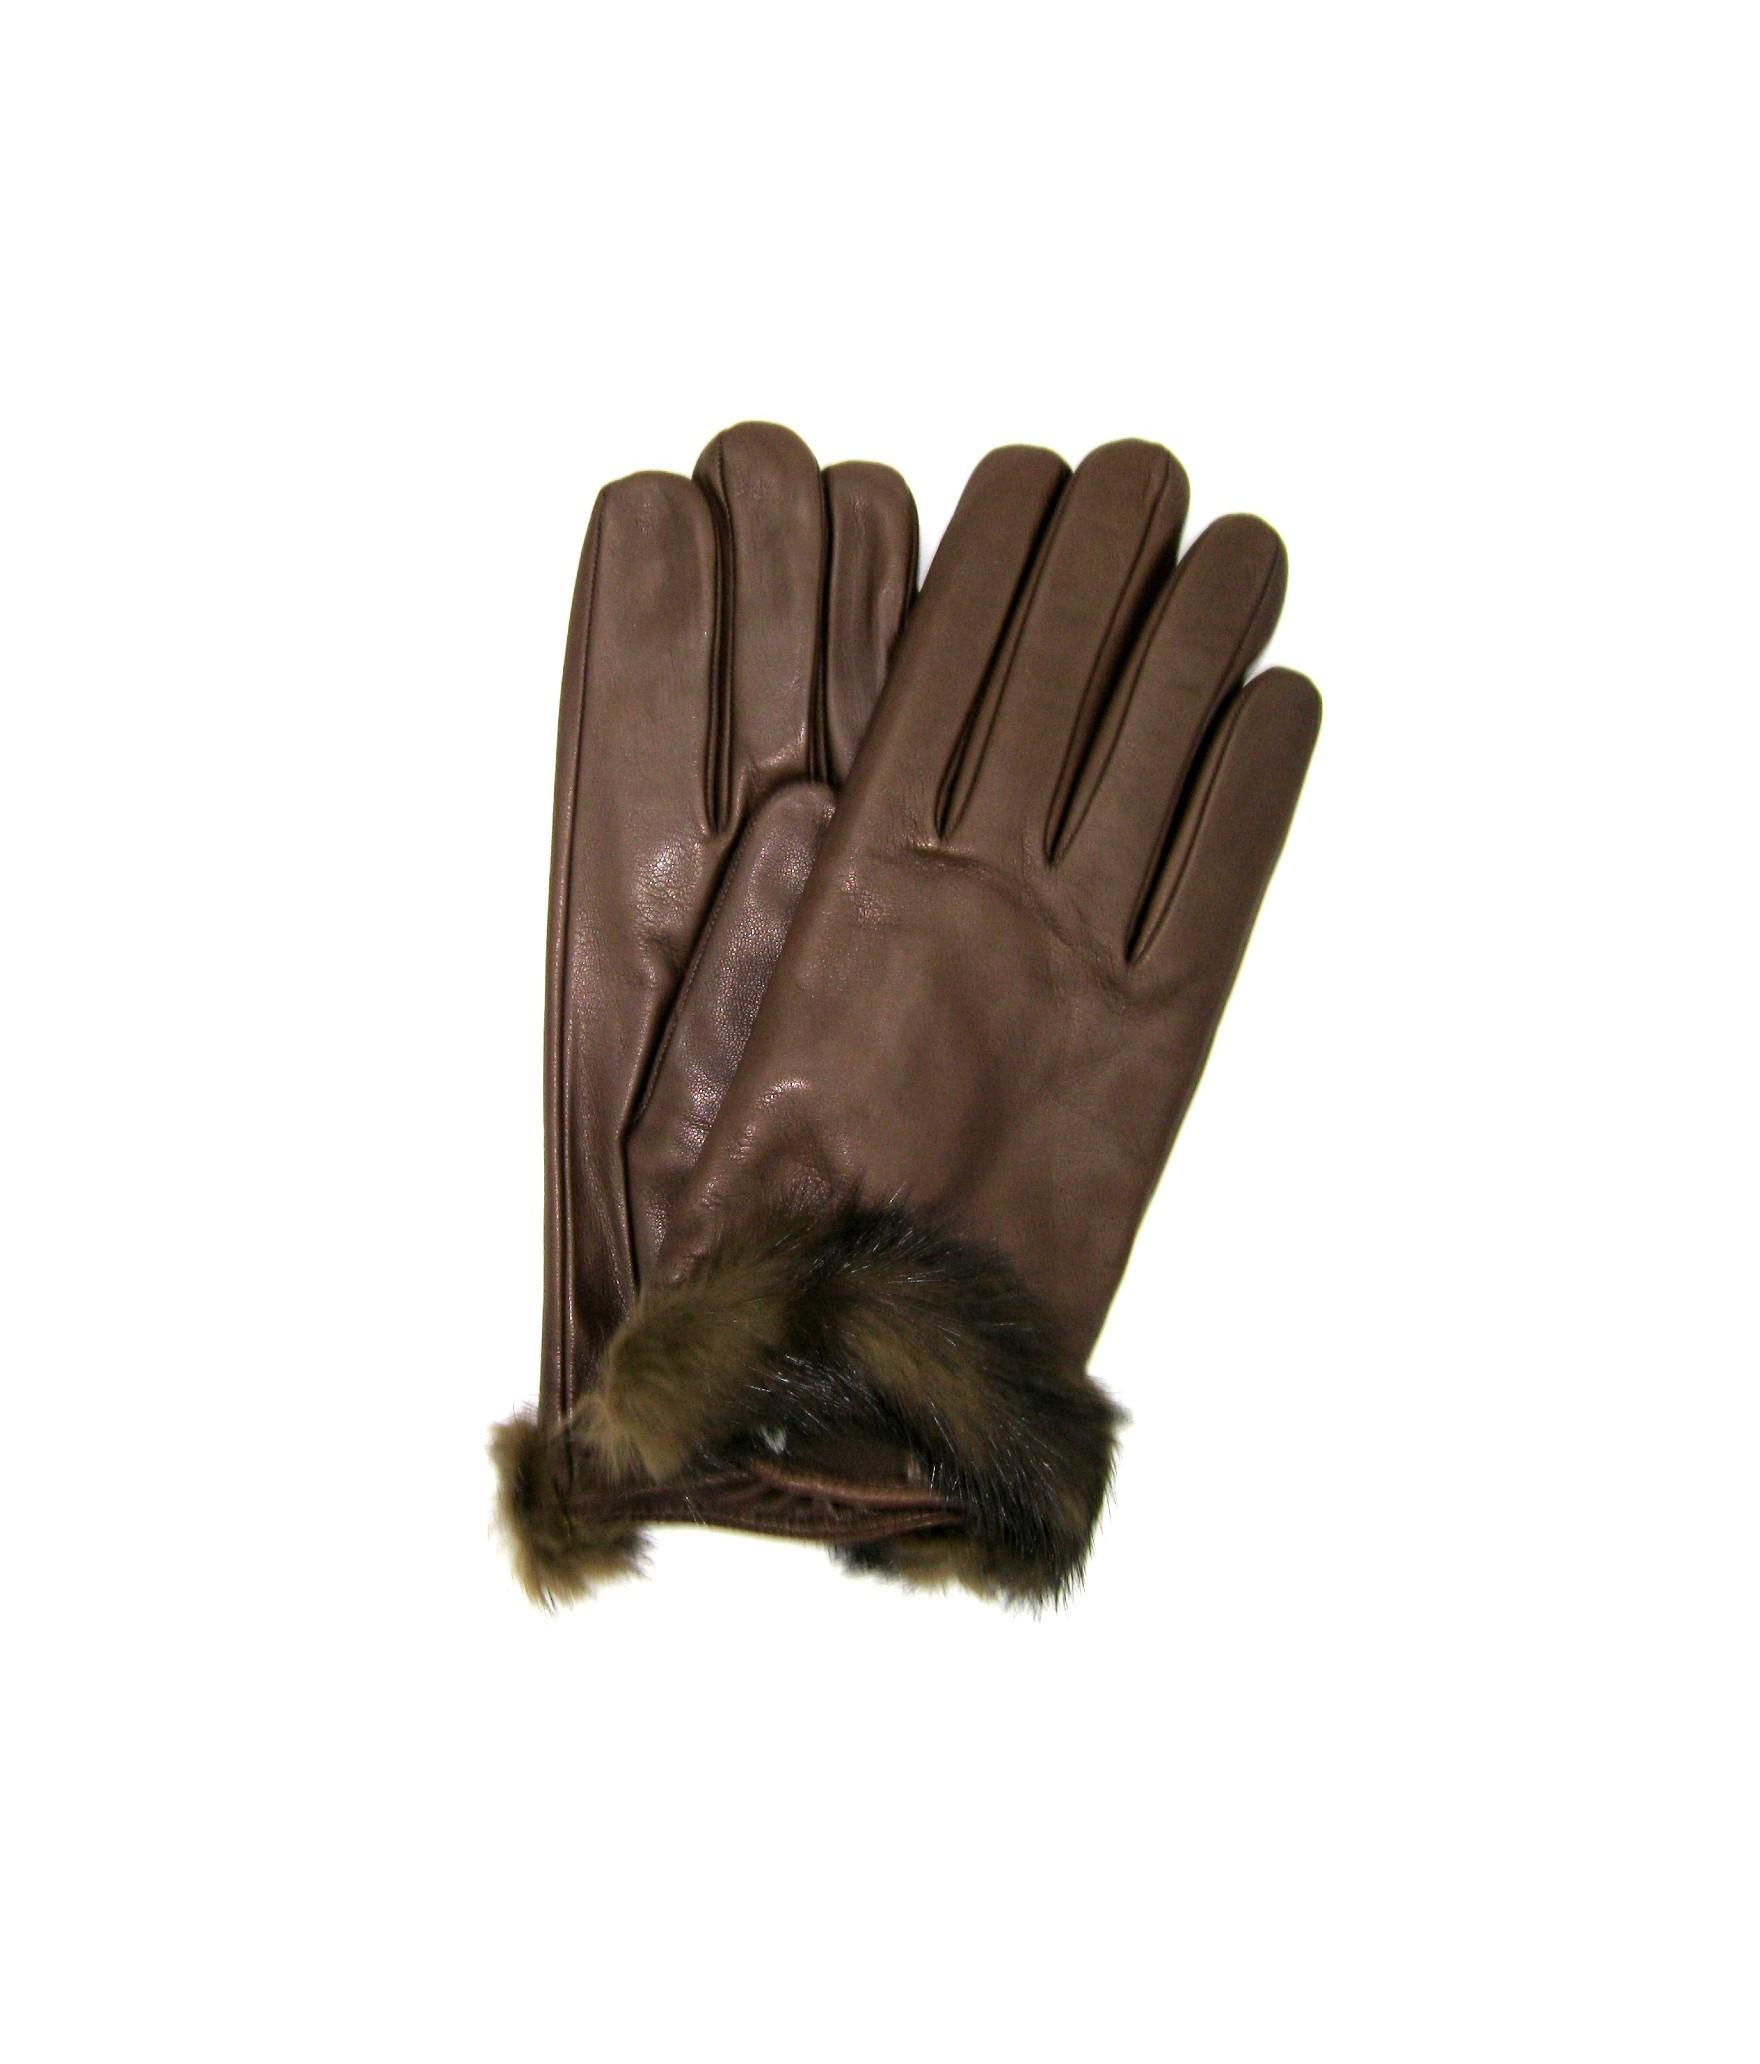 Guanto in Nappa fod cashmere bordo Visone Mink Sermoneta Gloves